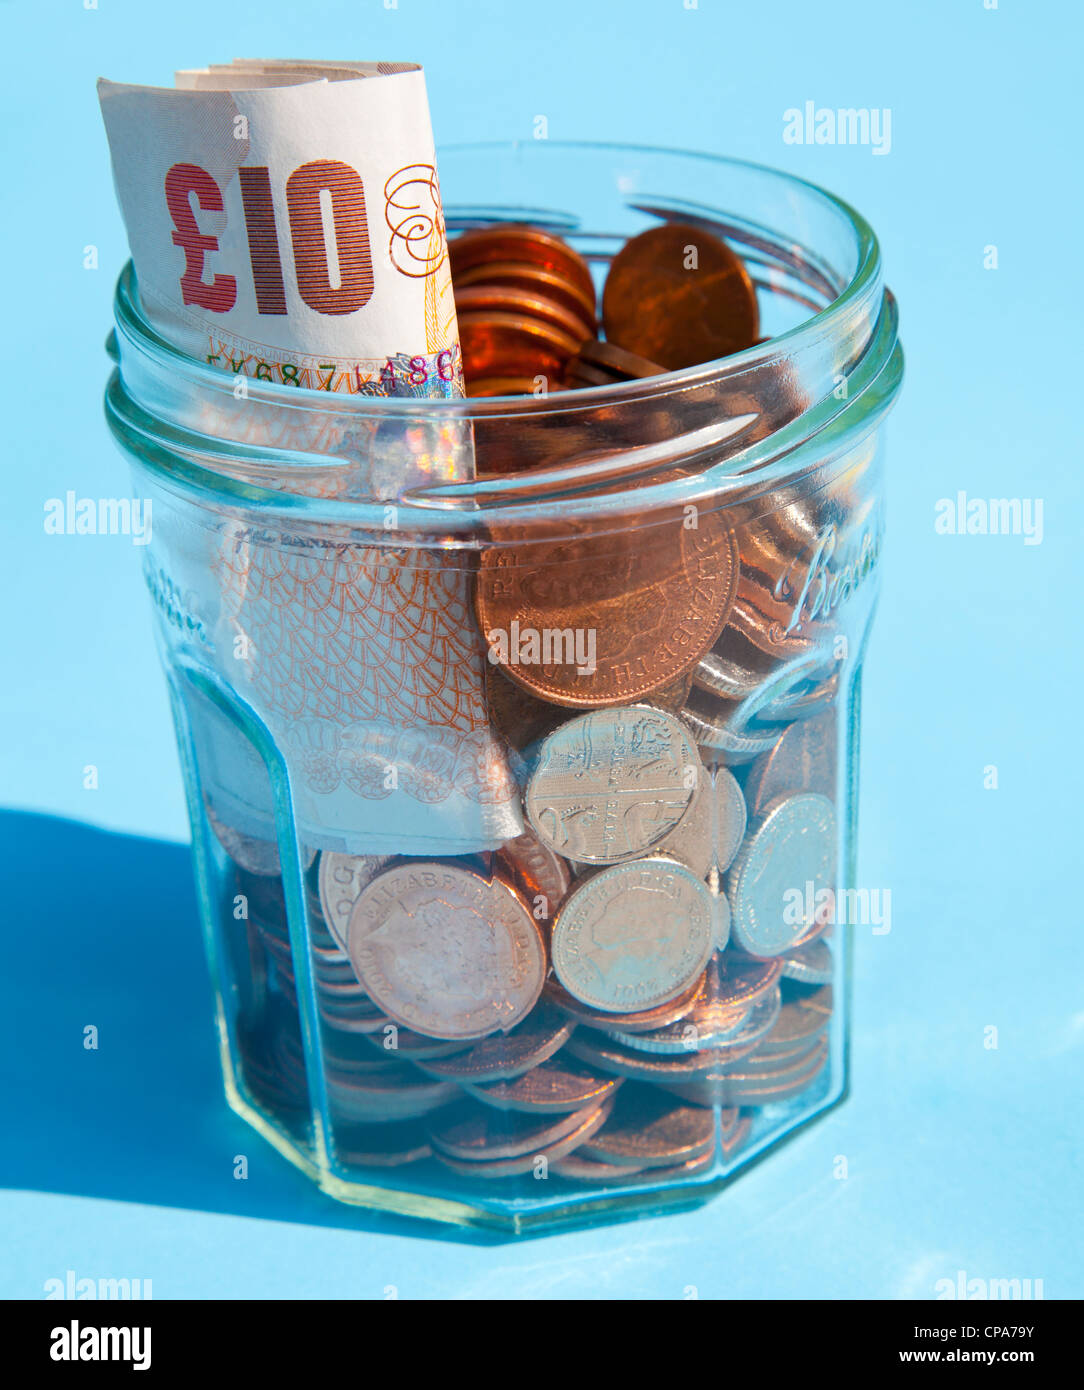 Savings in a jam jar - Stock Image